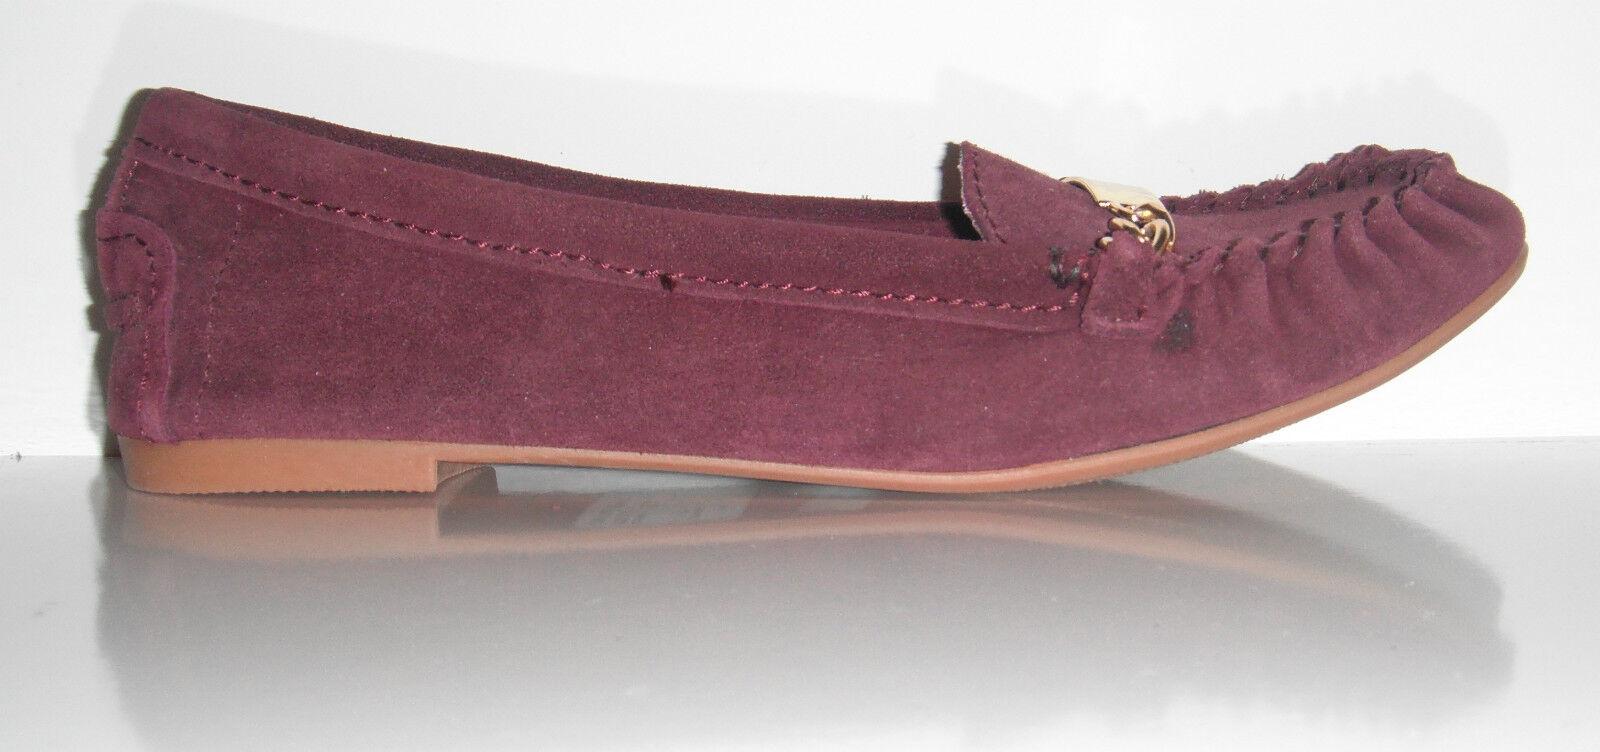 New Steve Madden Damens Meera Burgundy Suede Loafer Slip on Schuhe sz 8.5M